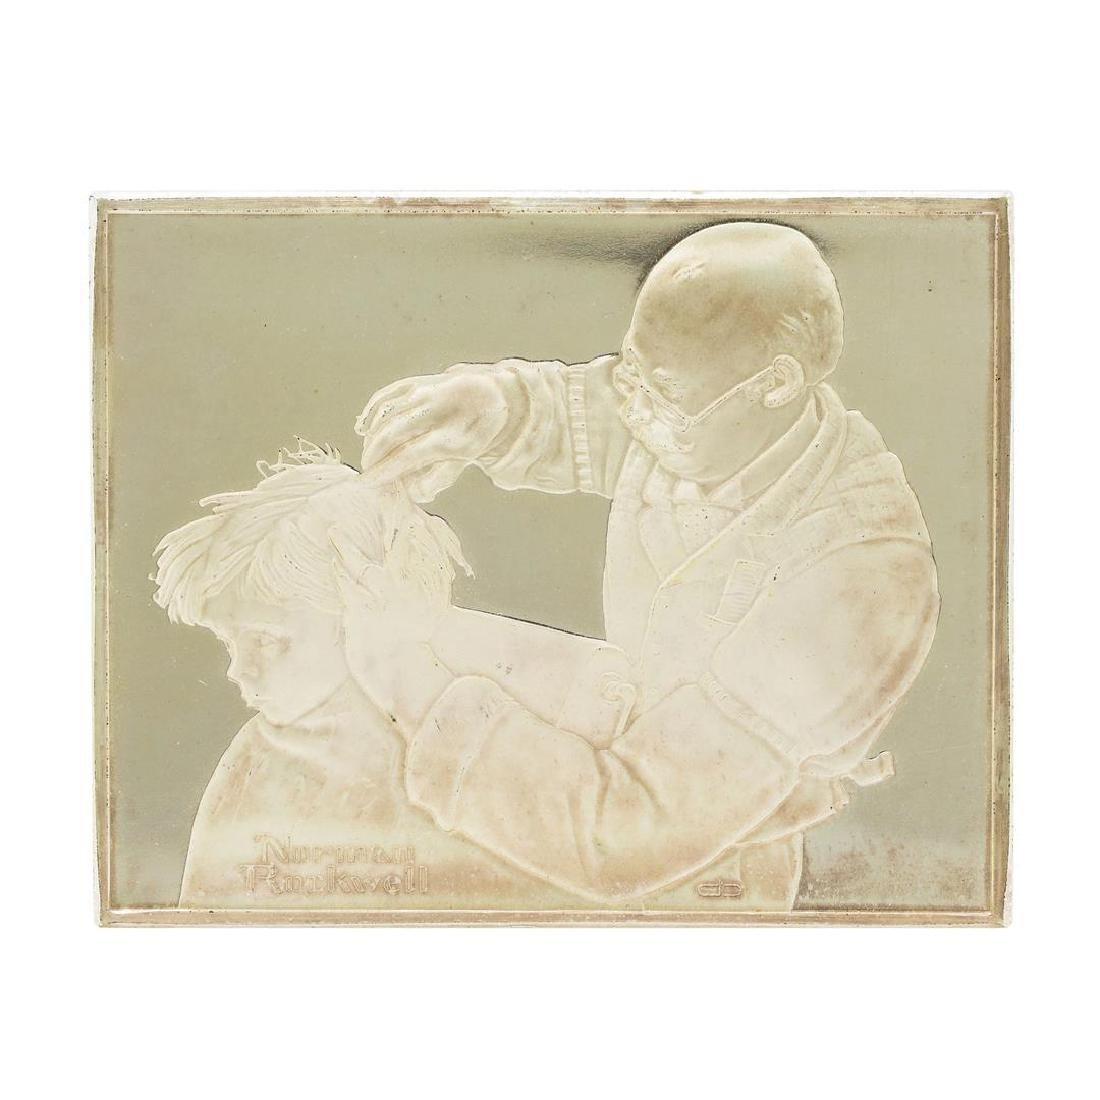 Norman Rockwell Fondest Memories 1500 Grains Sterling